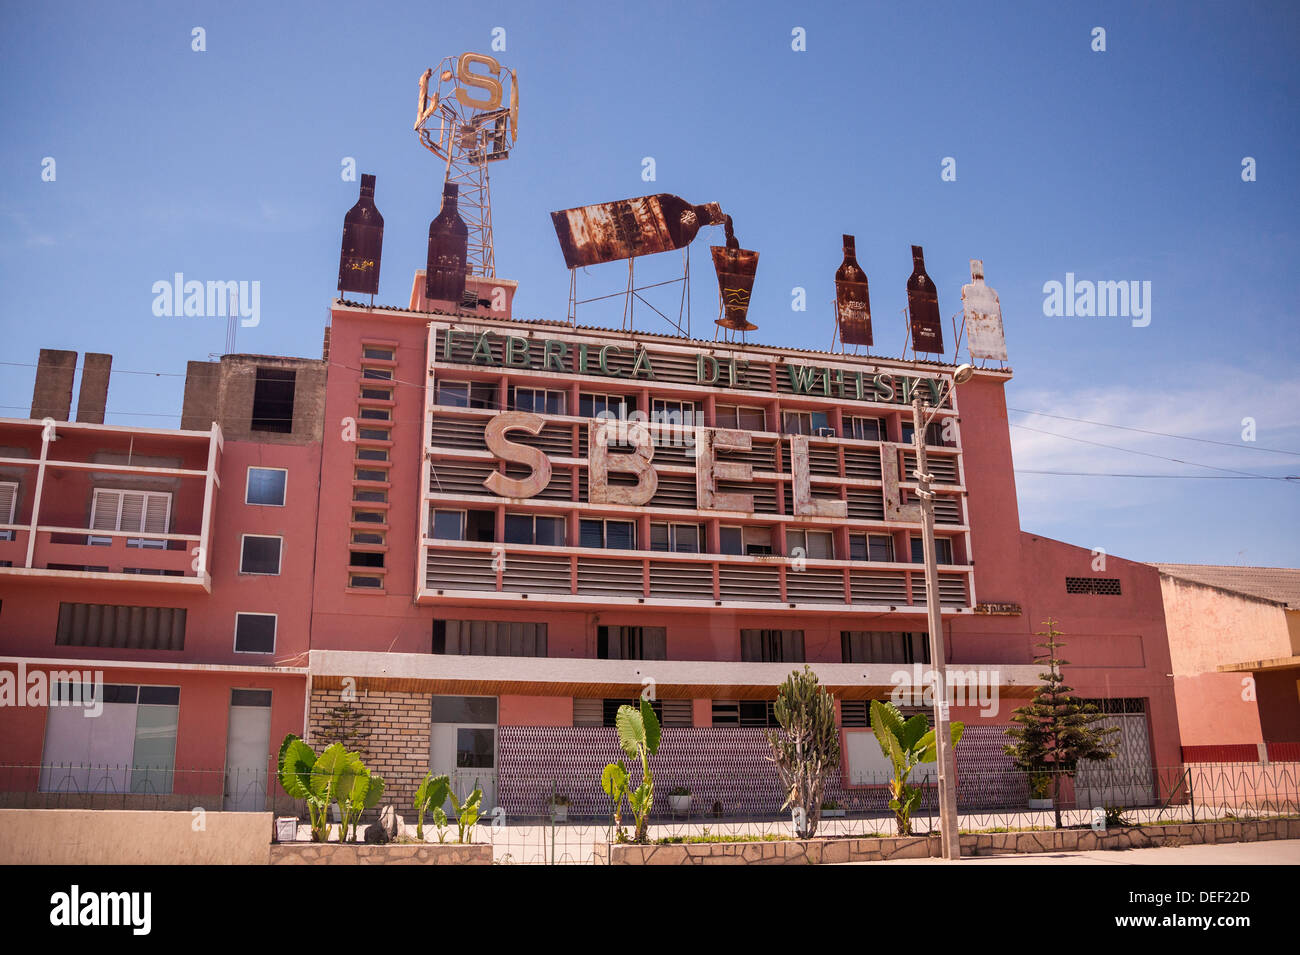 Africa, Angola, Lobito. Roadside shot of Sbell Whiskey factory. - Stock Image